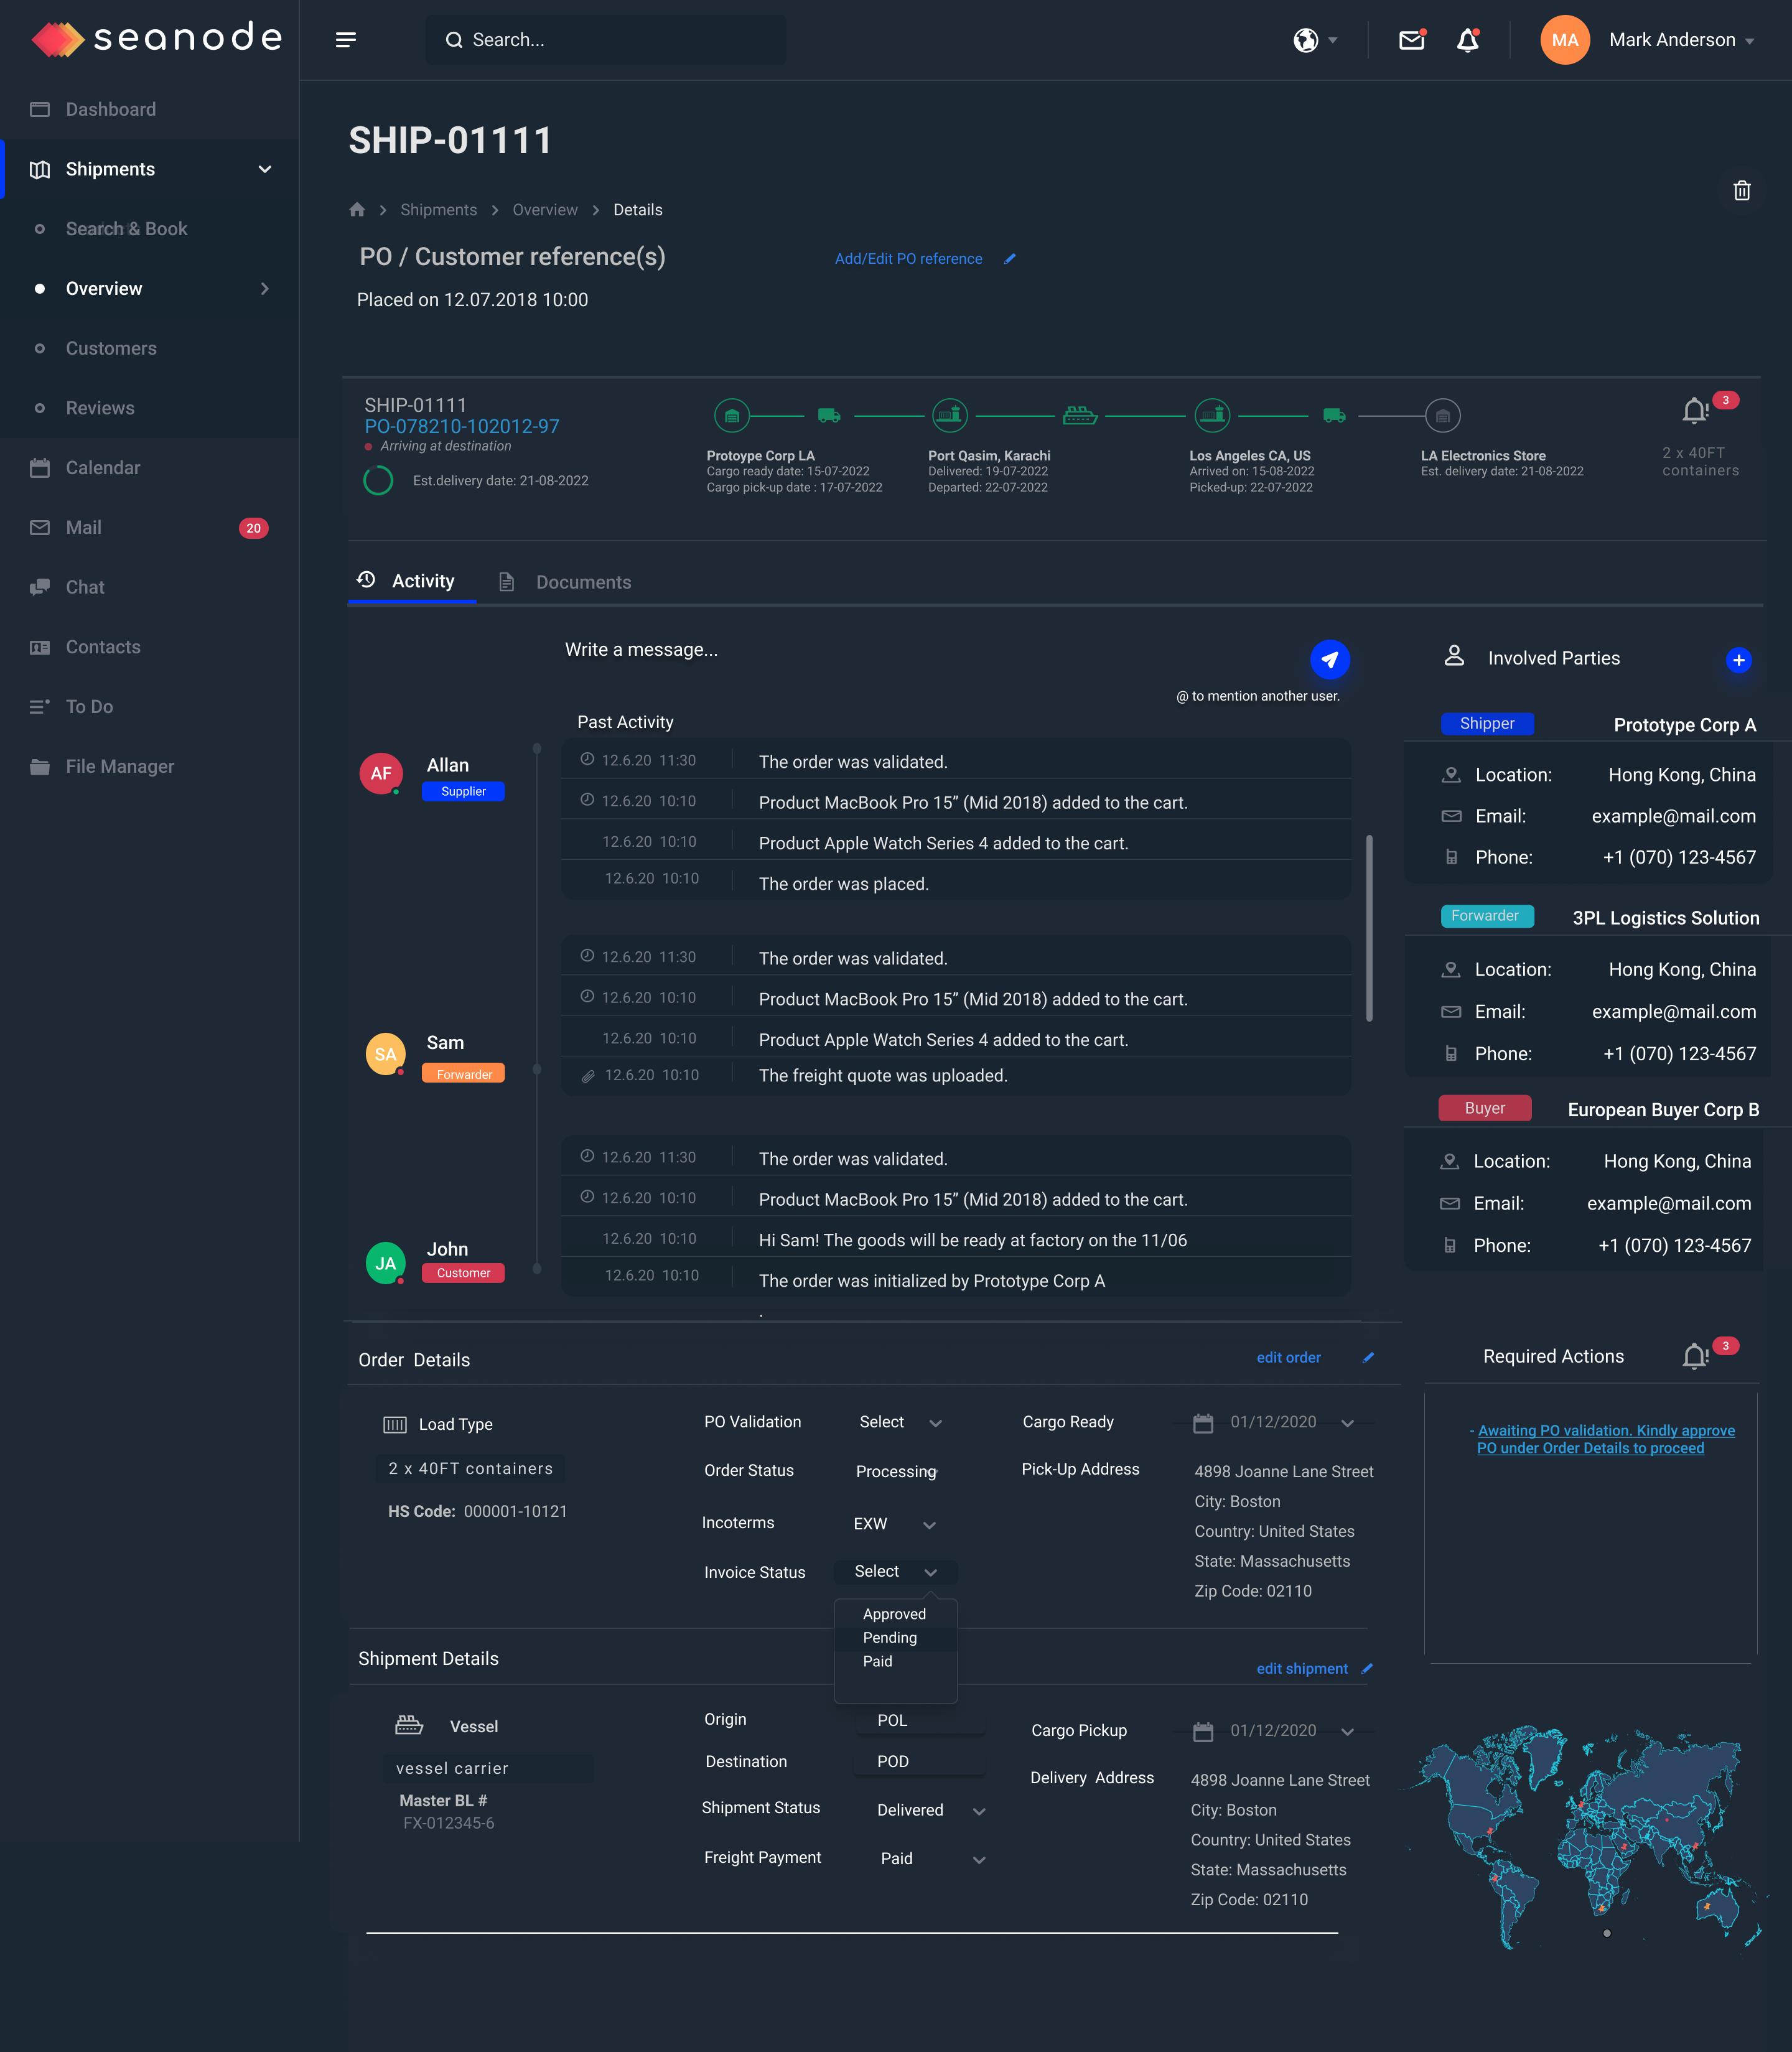 Seanode - Order Management Tool